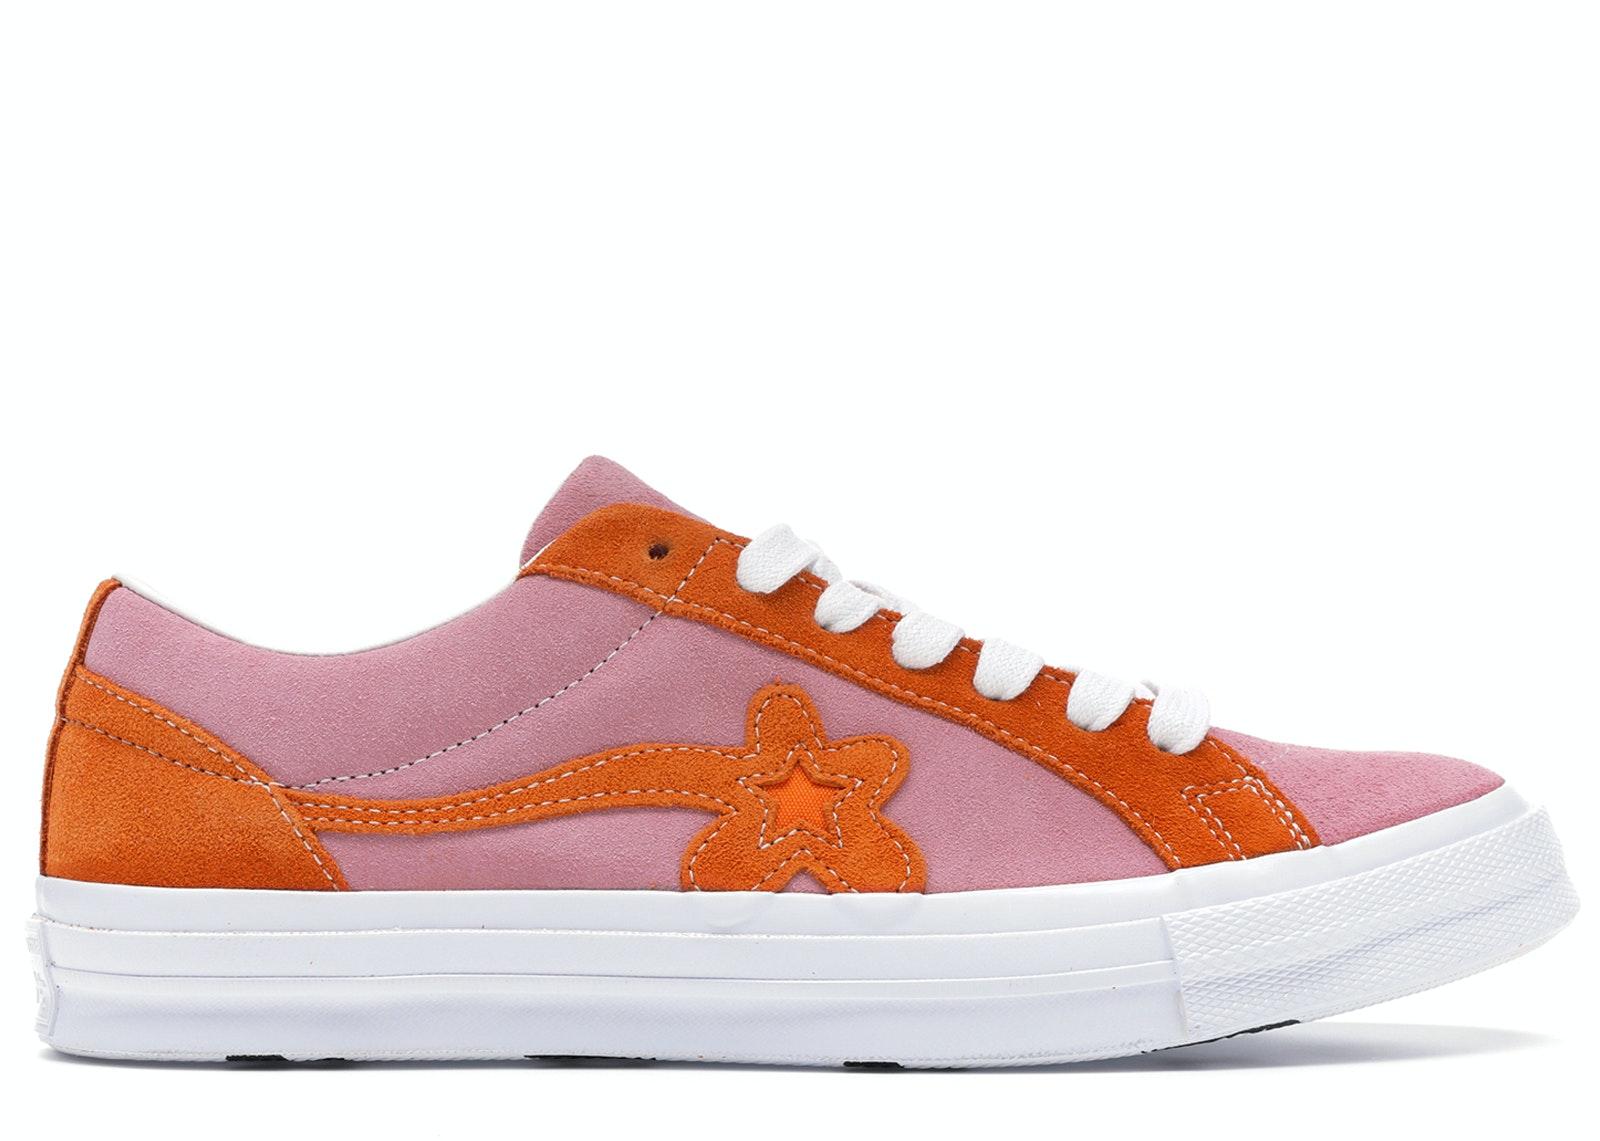 Converse One Star Ox Tyler the Creator Golf Le Fleur Pink Orange